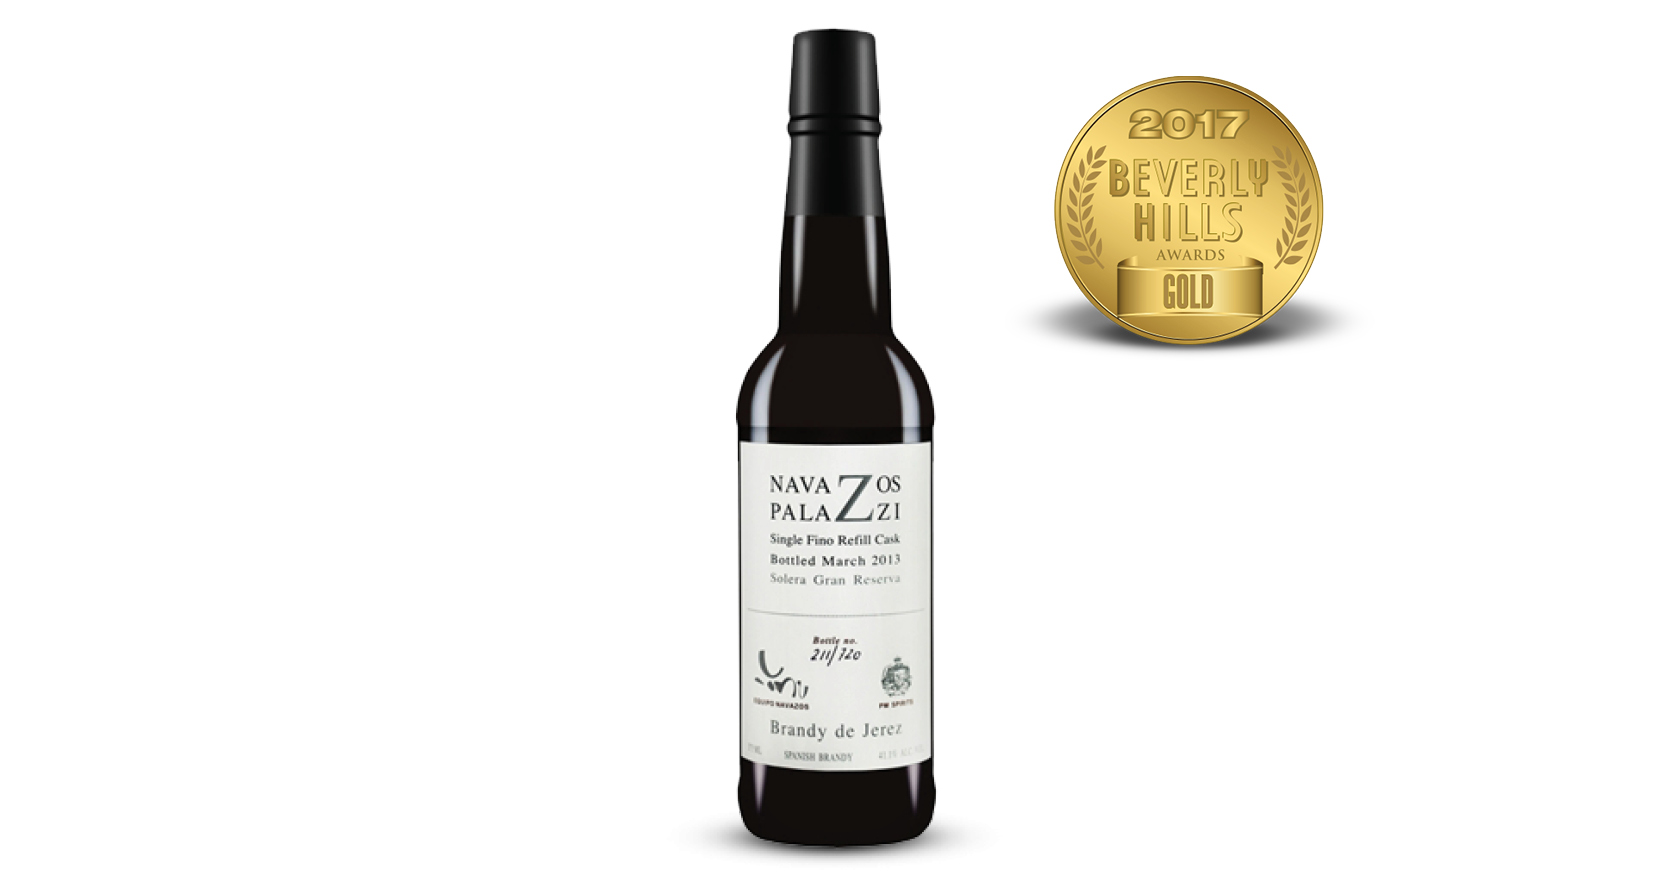 Navazos-Palazzi Jerez Brandy-Release 2 Single Fino Cask